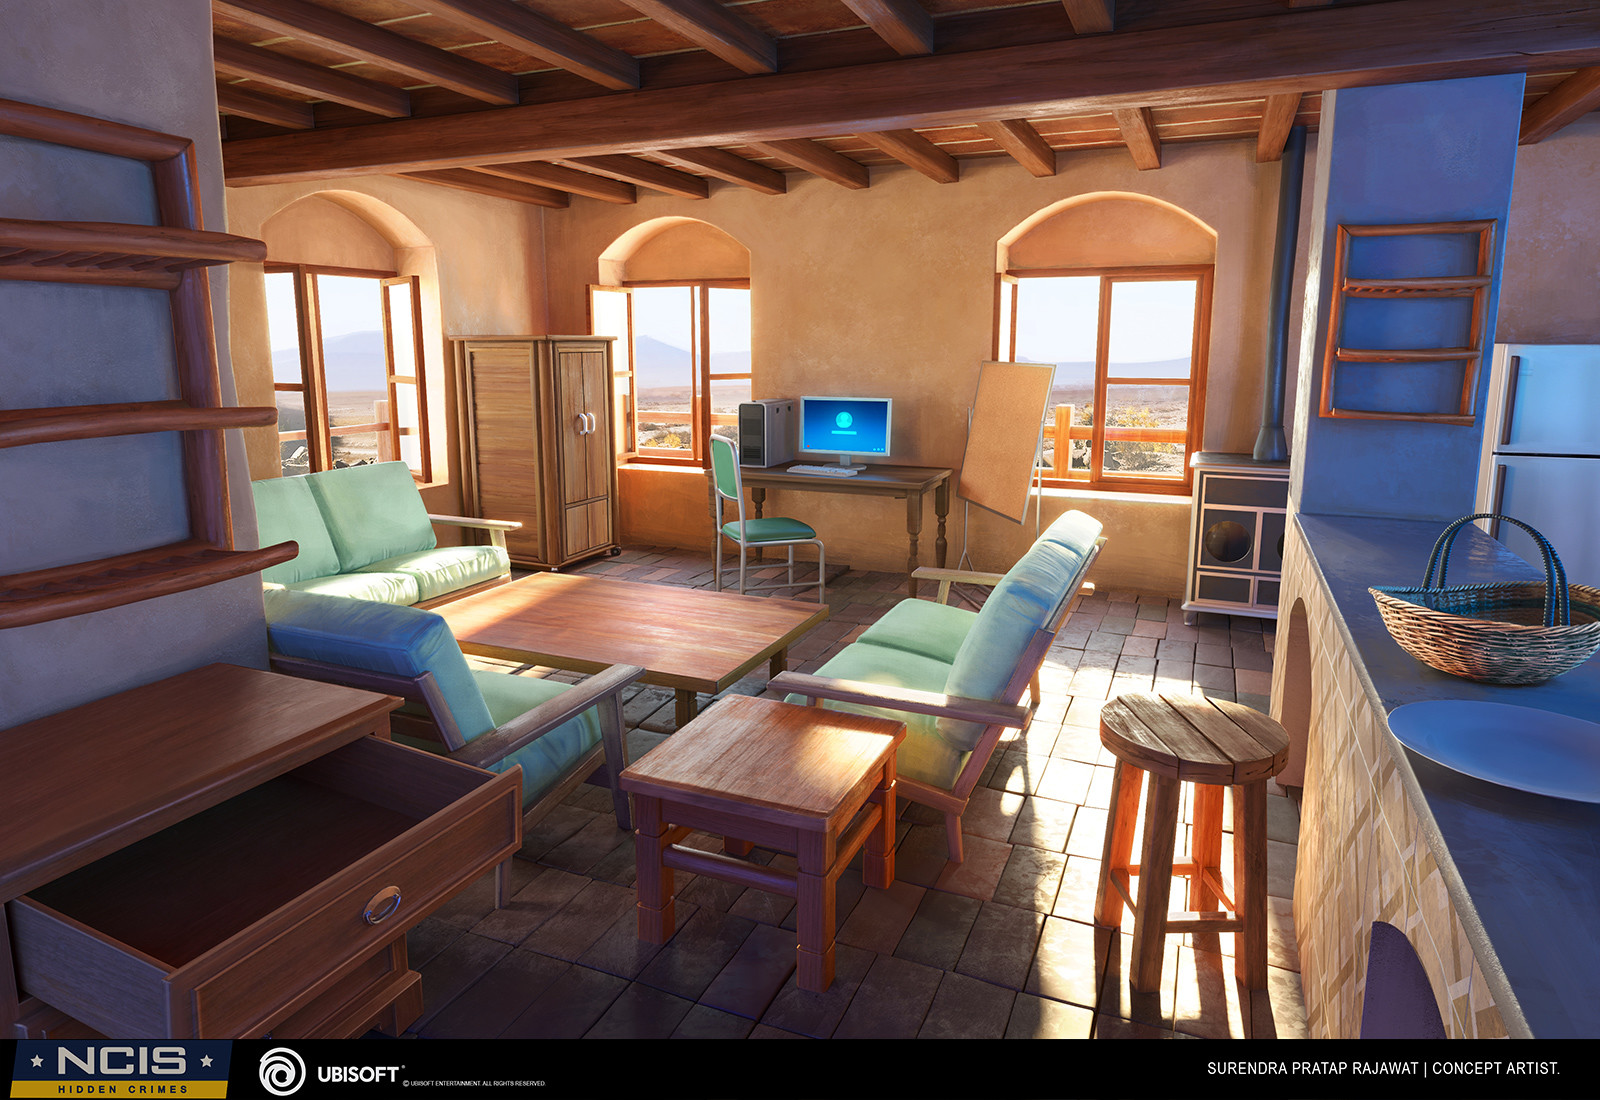 Surendra rajawat safe house concept